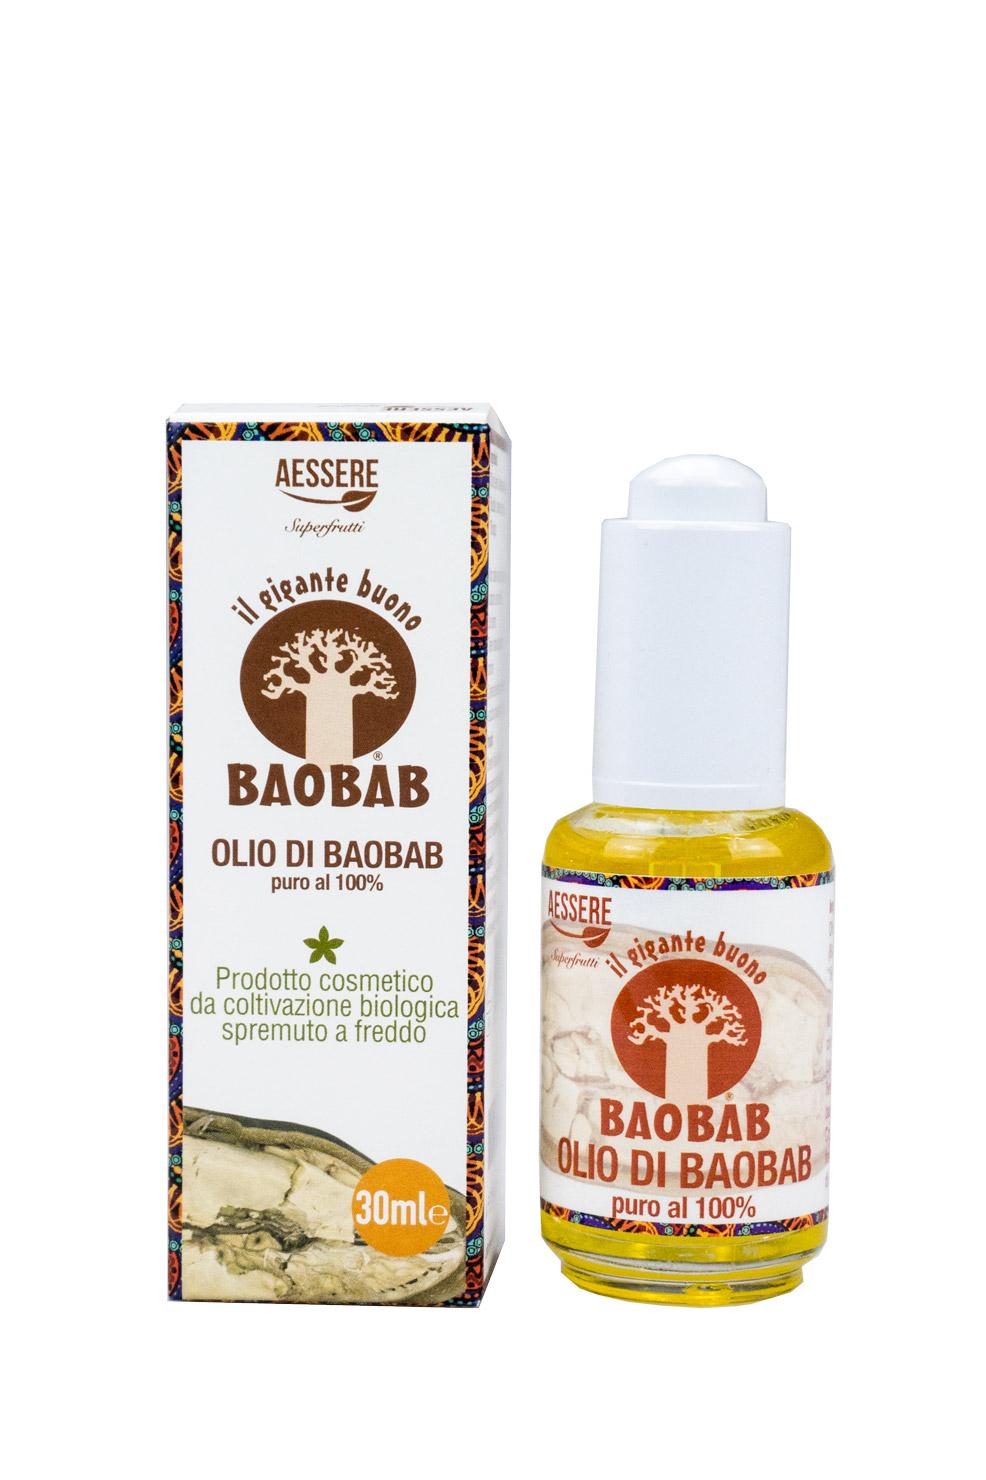 Image of Aessere Baobab Olio Puro Al 100% 30ml 939410508